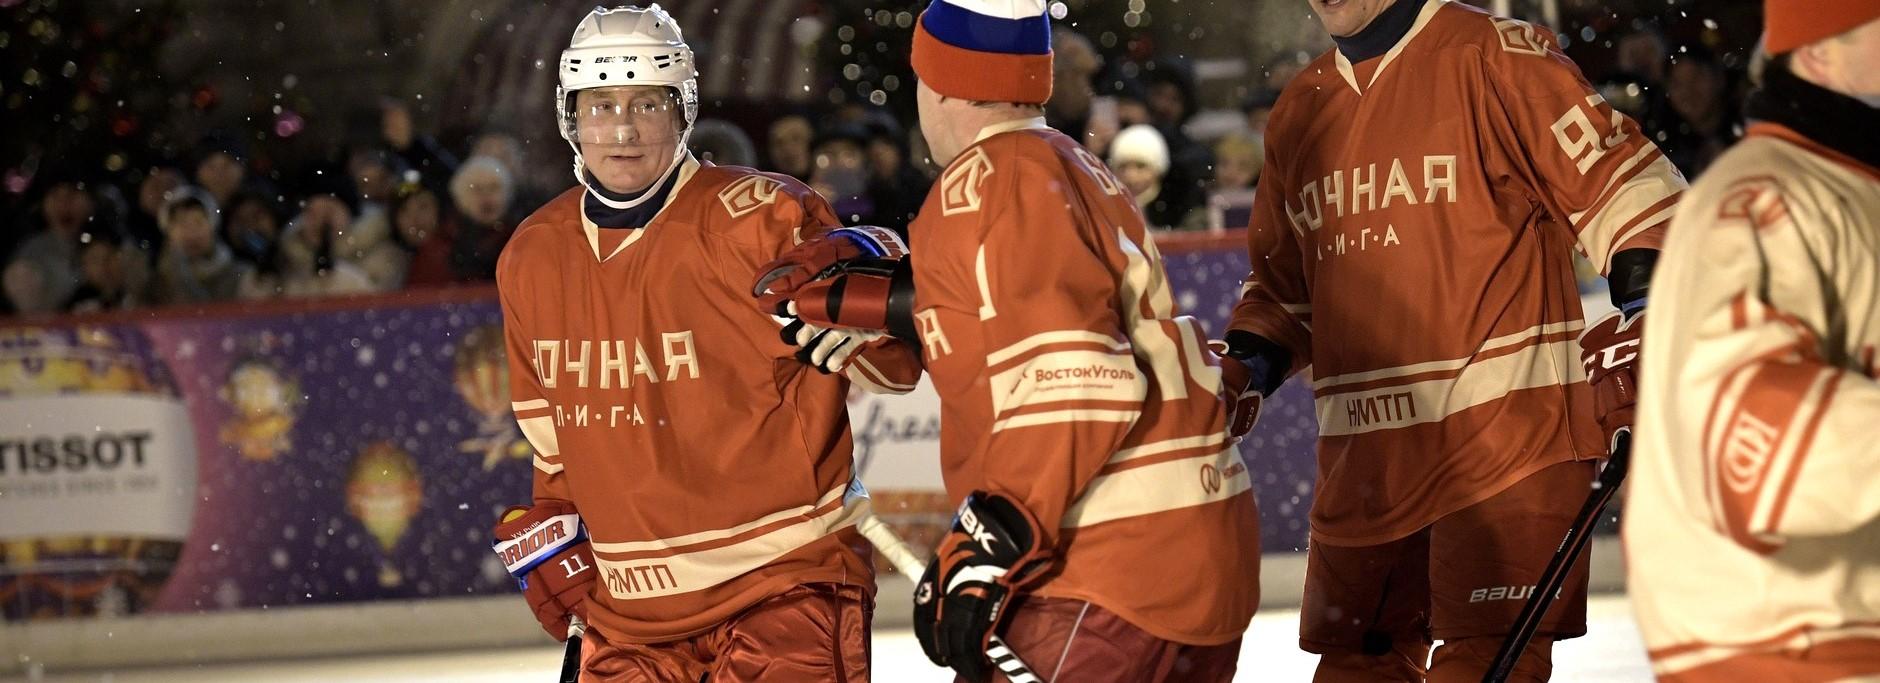 Russian President Vladimir Putin at a night hockey game, December 2017 (Photo: kremlin.ru)